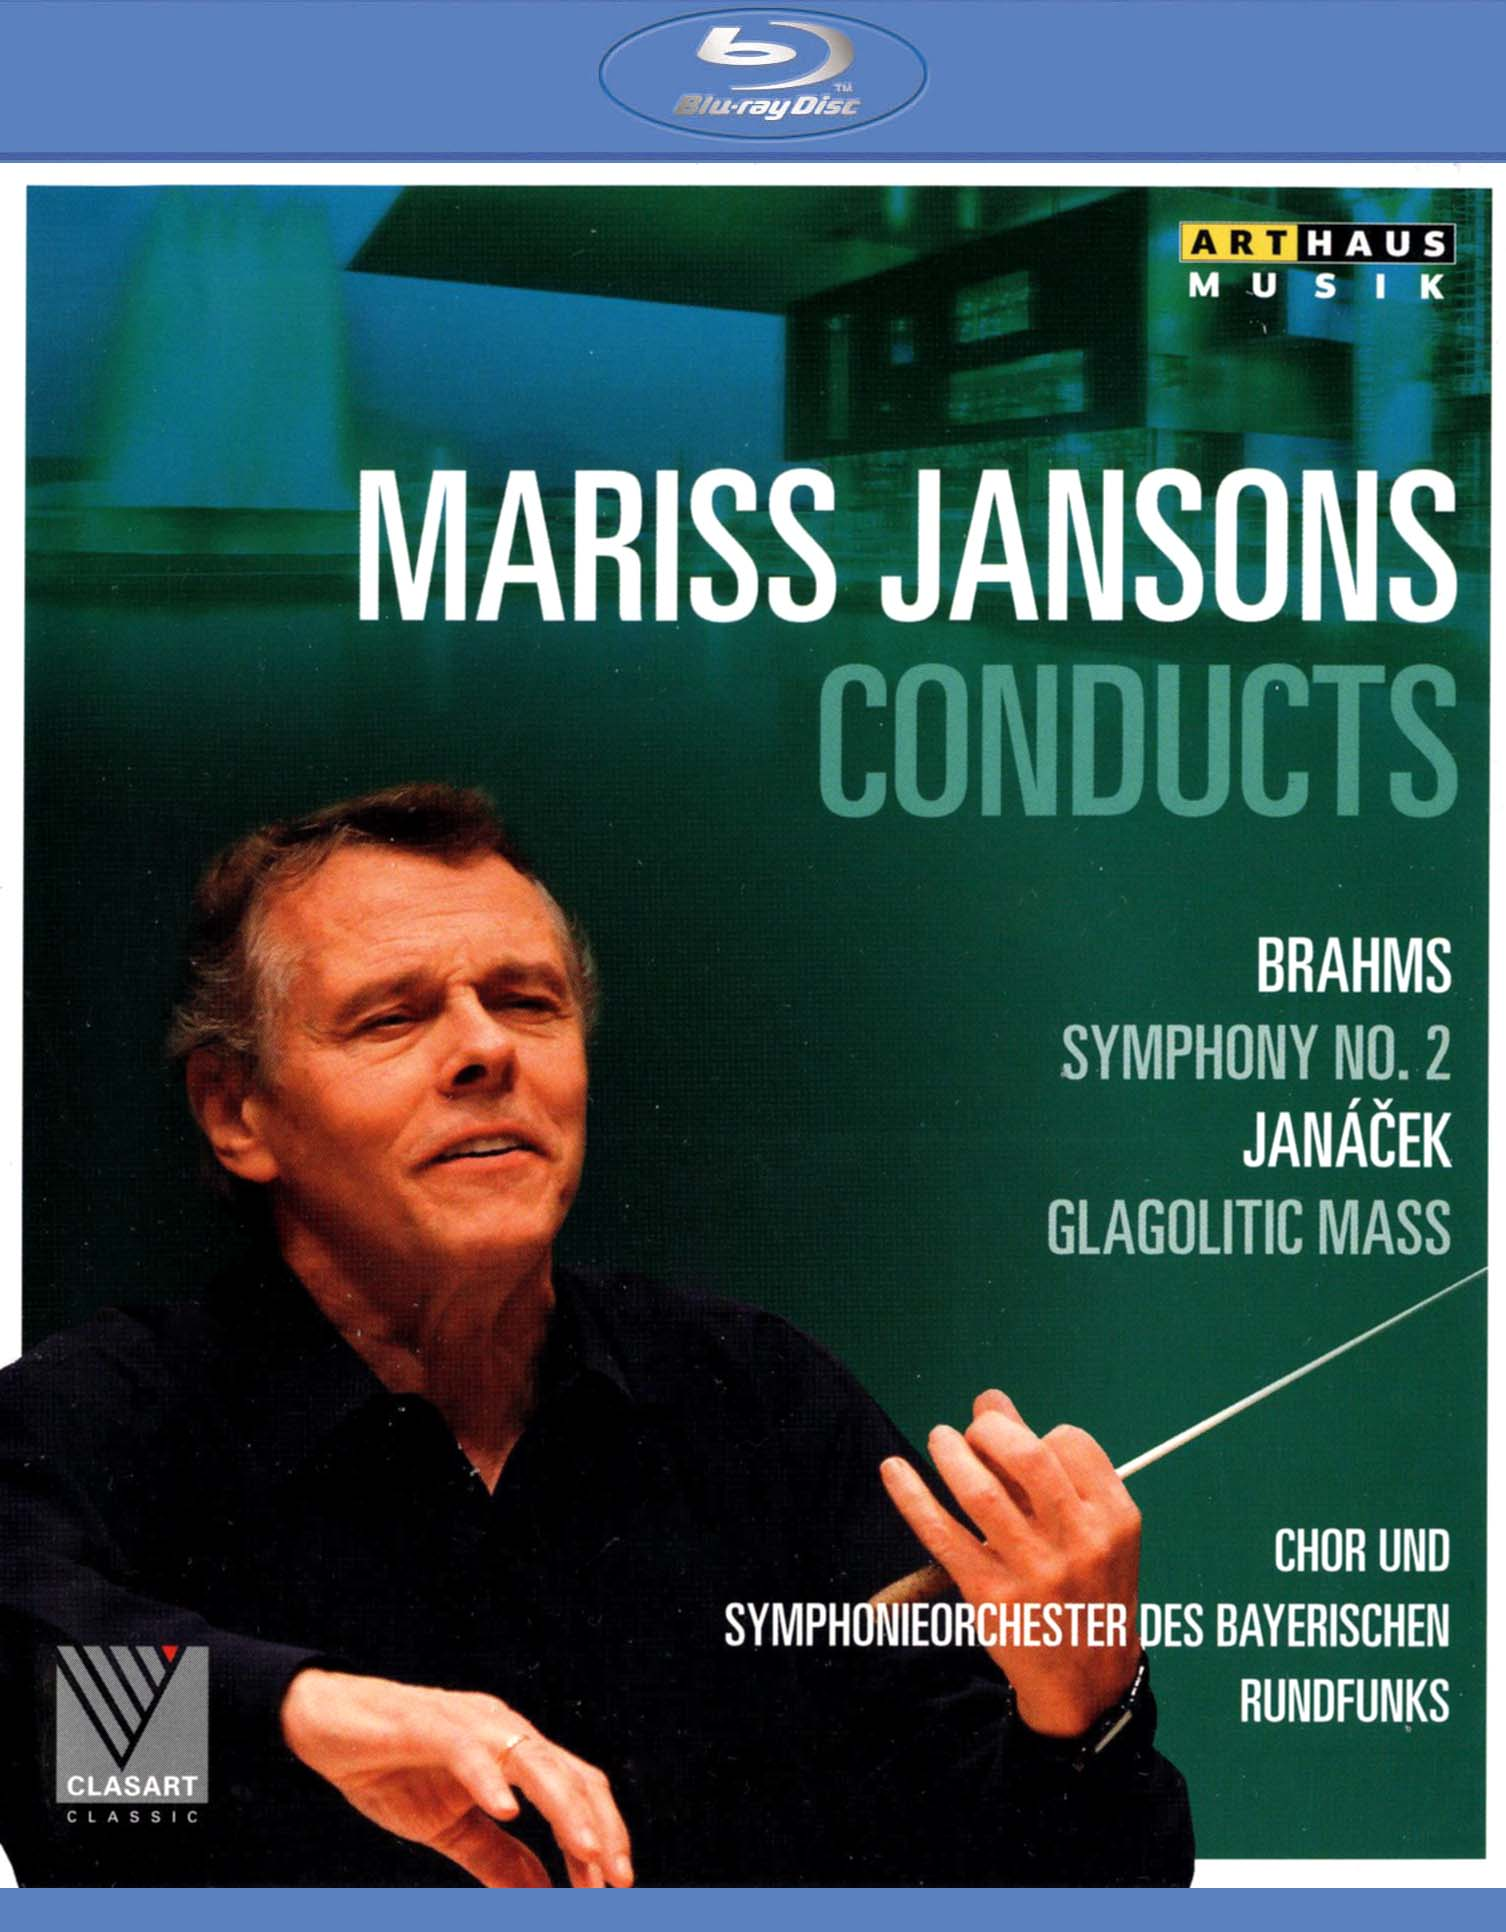 Mariss Jansons Conducts: Brahms/Janacek